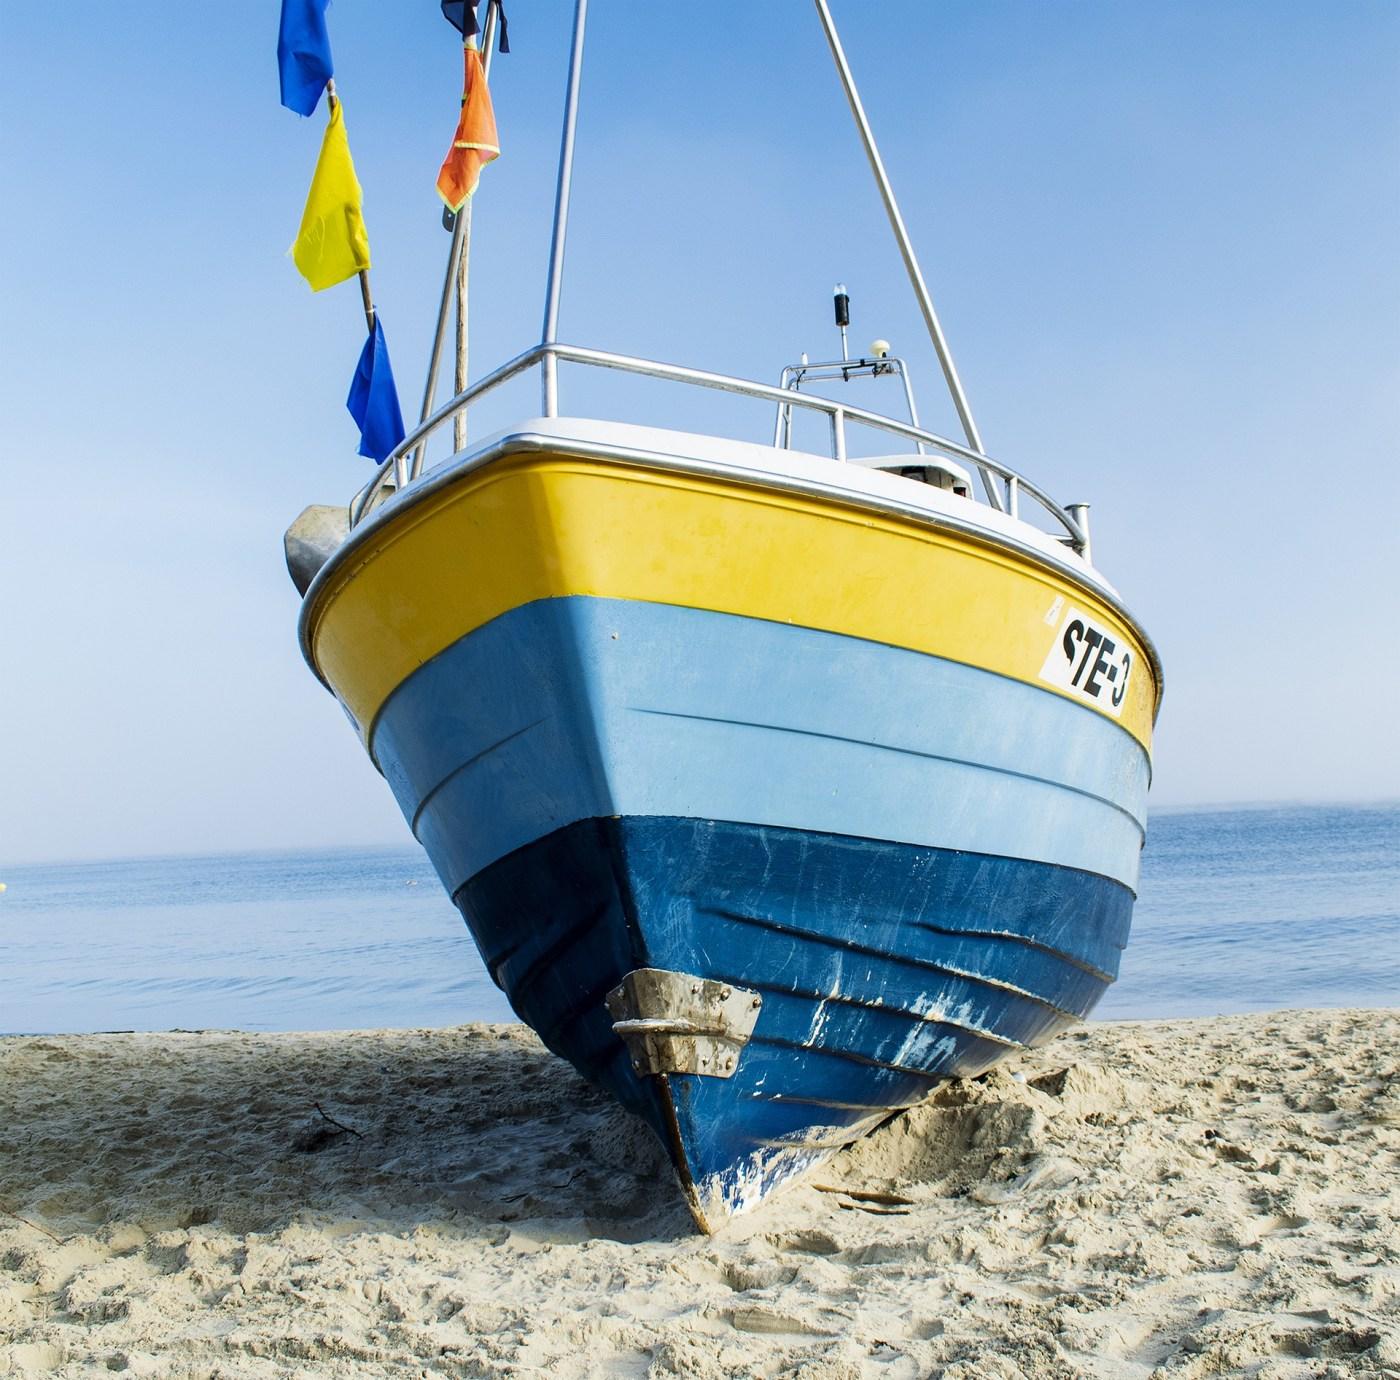 Fated Sail